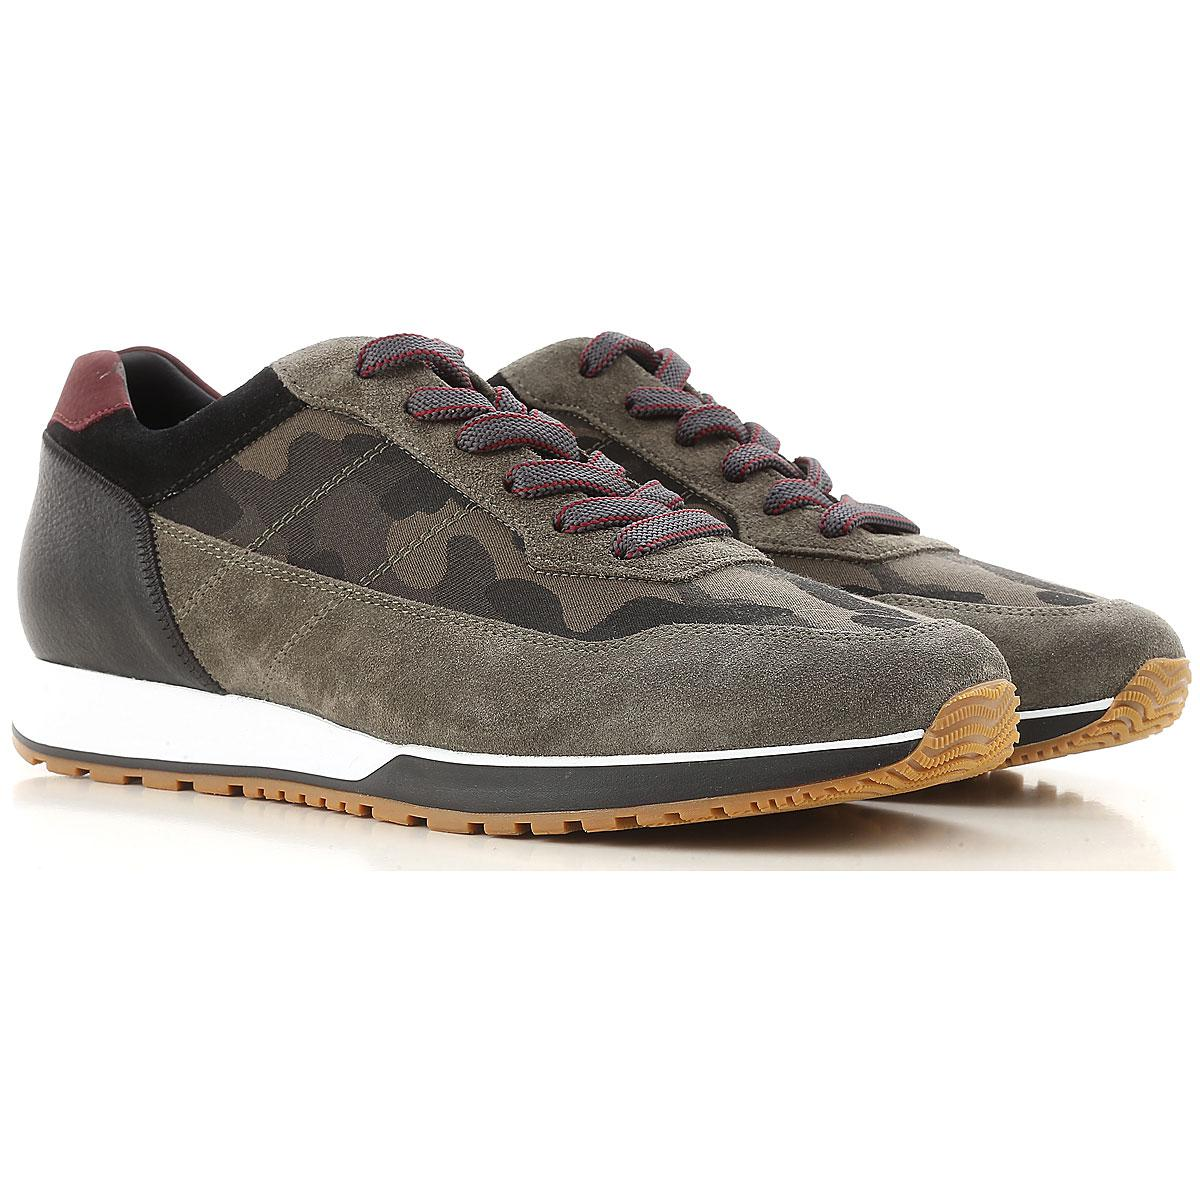 48ecc004bf Lyst - Hogan Shoes For Men for Men